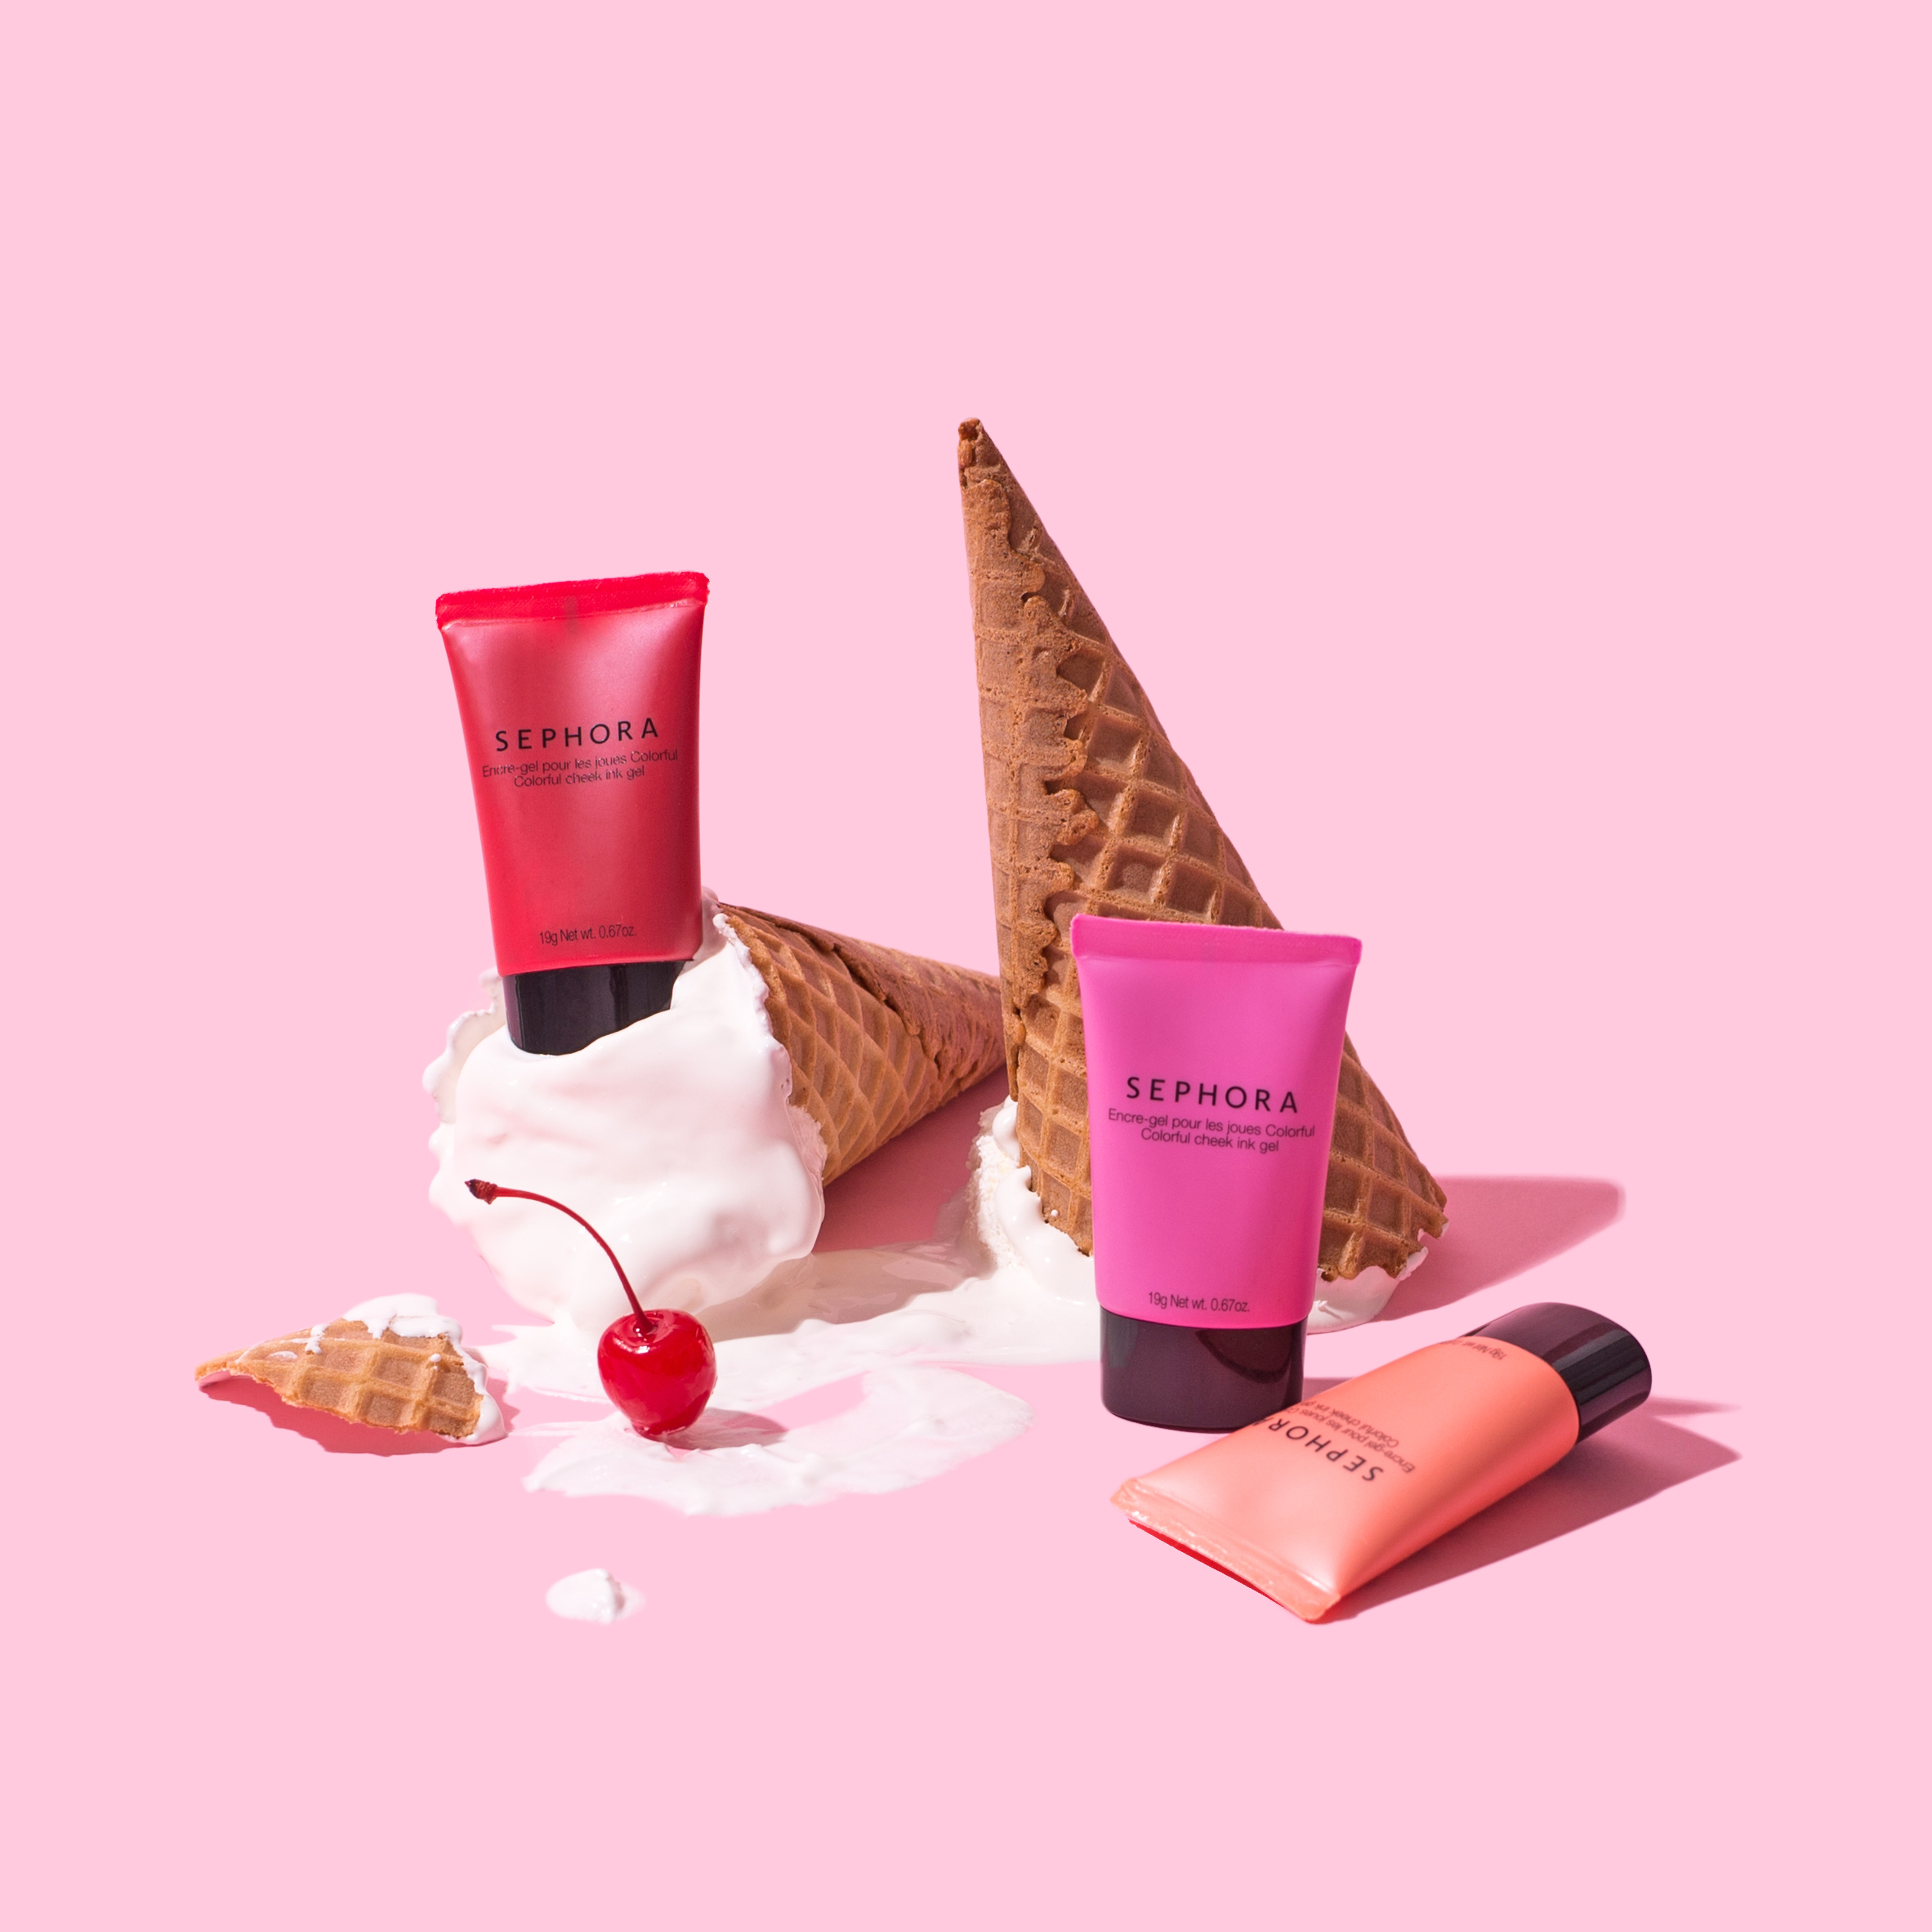 Sephora Cheek Stain Cherry On Top 1D.jpg